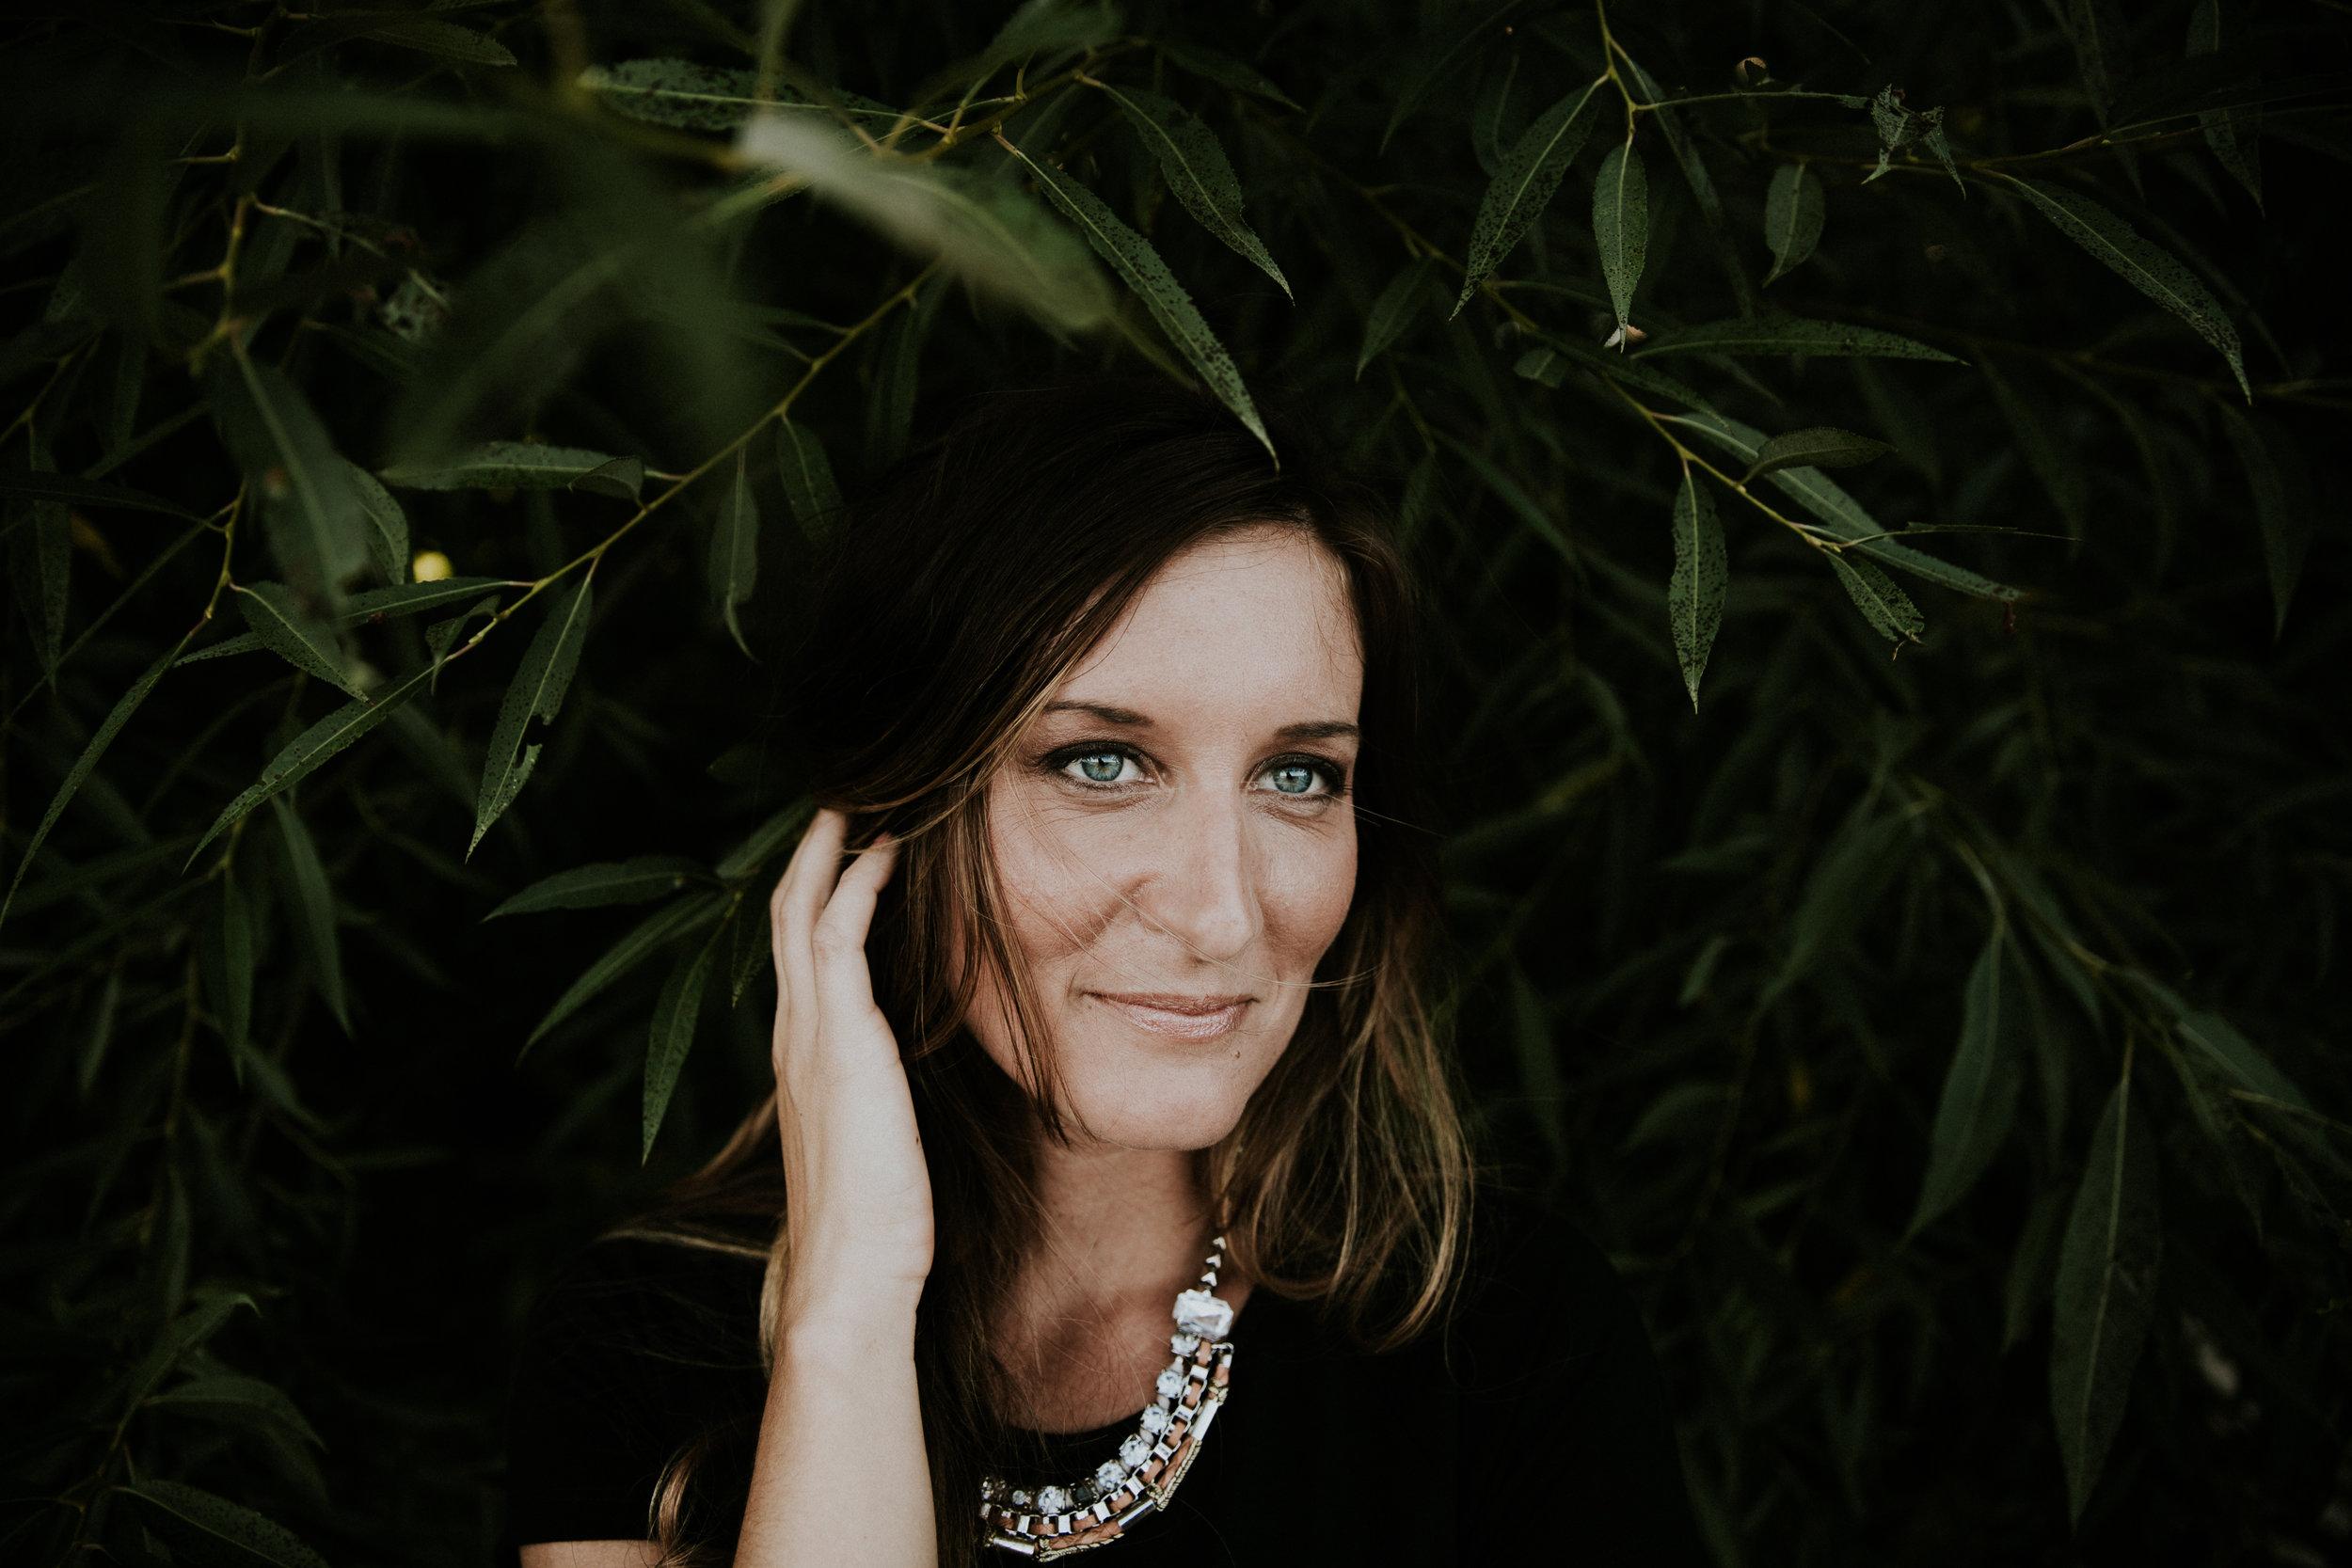 Amanda_Evanston-3.jpg